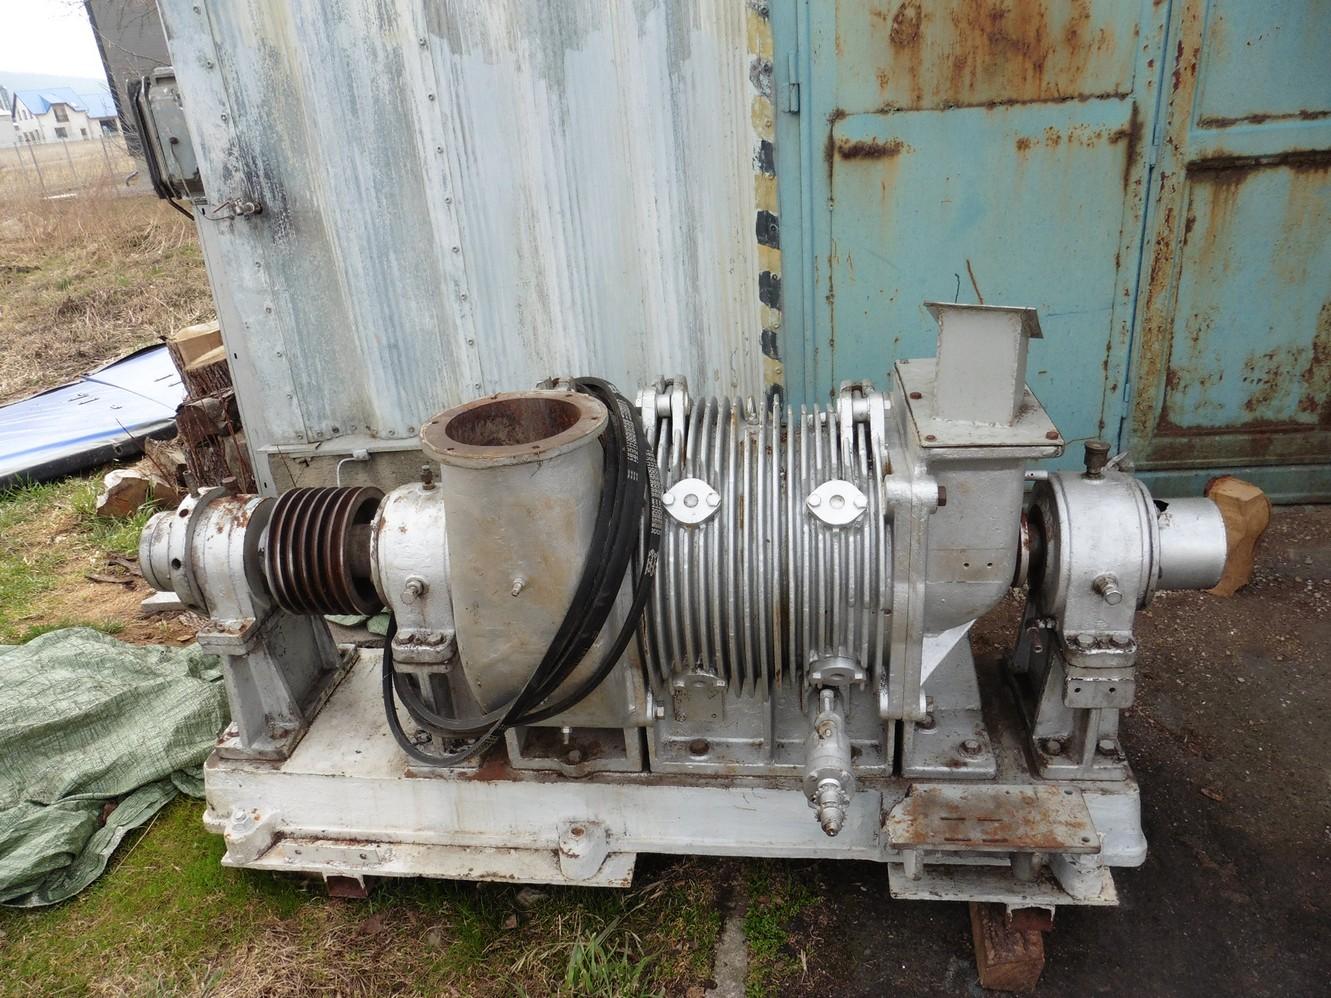 Hosokava model M502NC Super Micron Mill